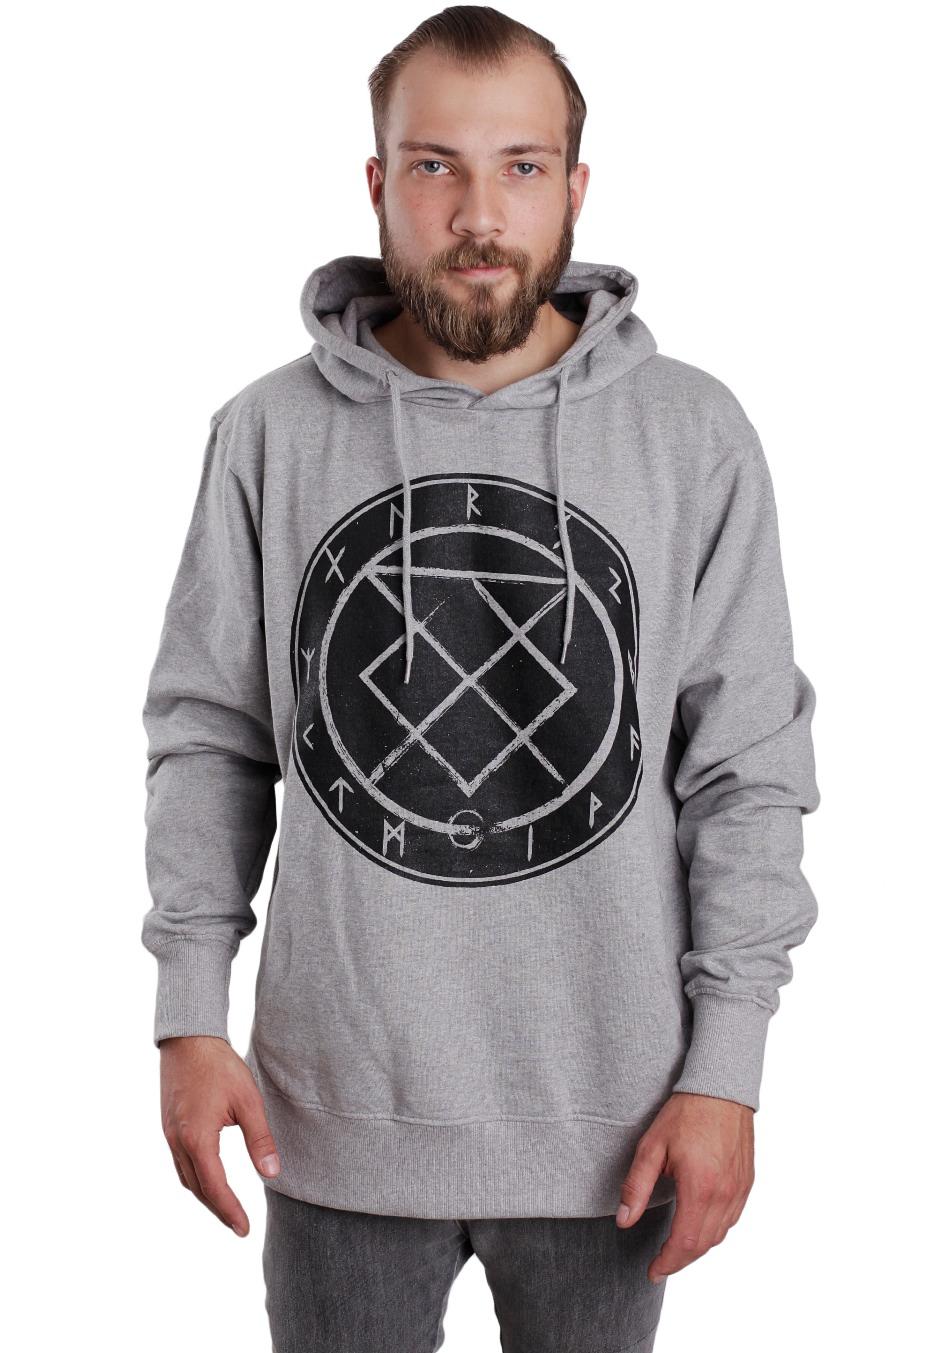 bury tomorrow rune crest sportsgrey hoodie uk. Black Bedroom Furniture Sets. Home Design Ideas